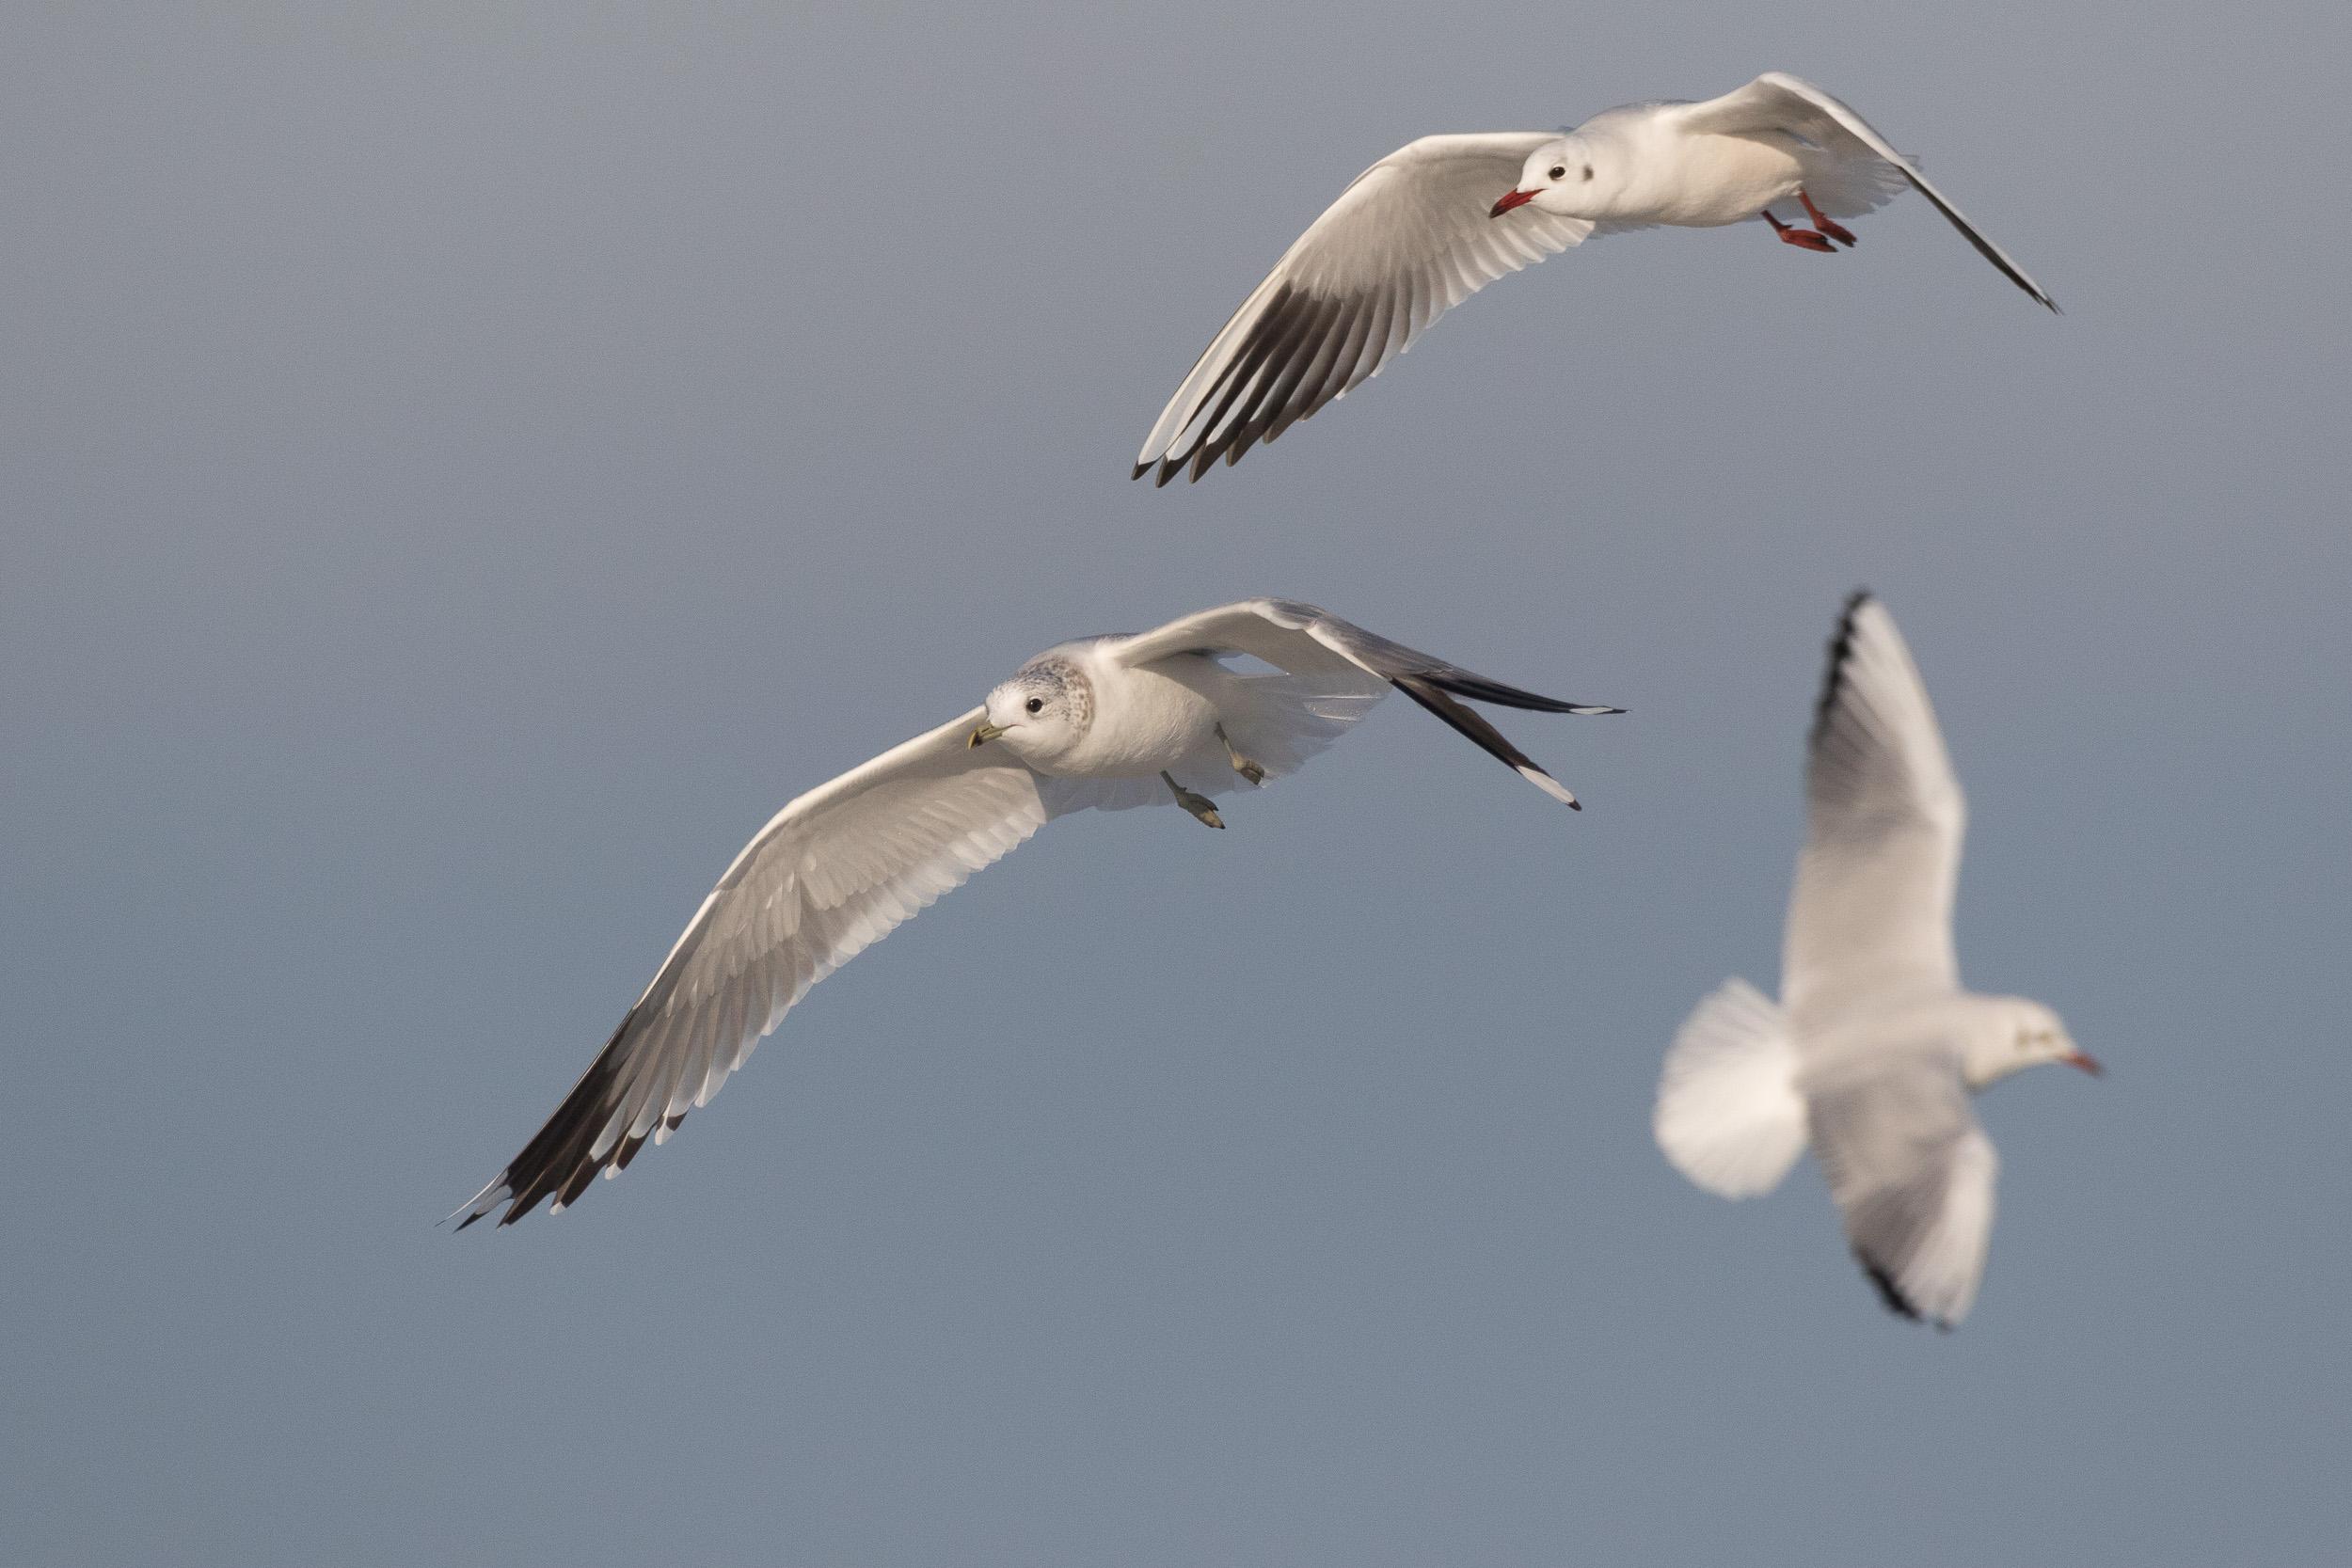 Common Gull (Larus canus) & Black-headed Gulls (Chroicocephalus ridibundus